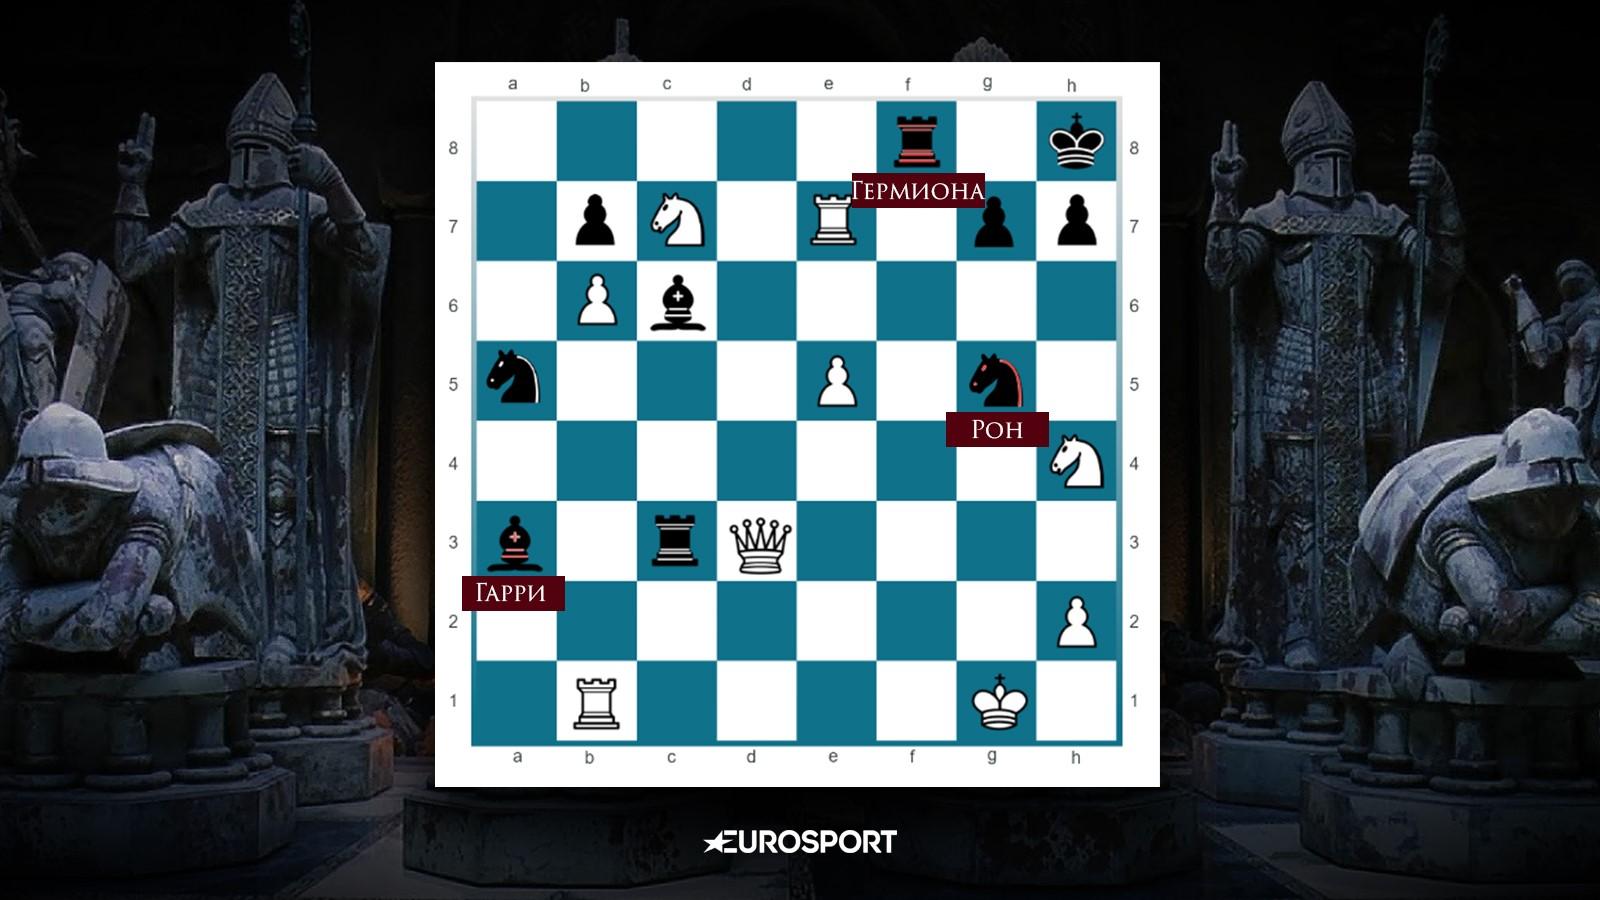 https://i.eurosport.com/2021/01/08/2967125.jpg